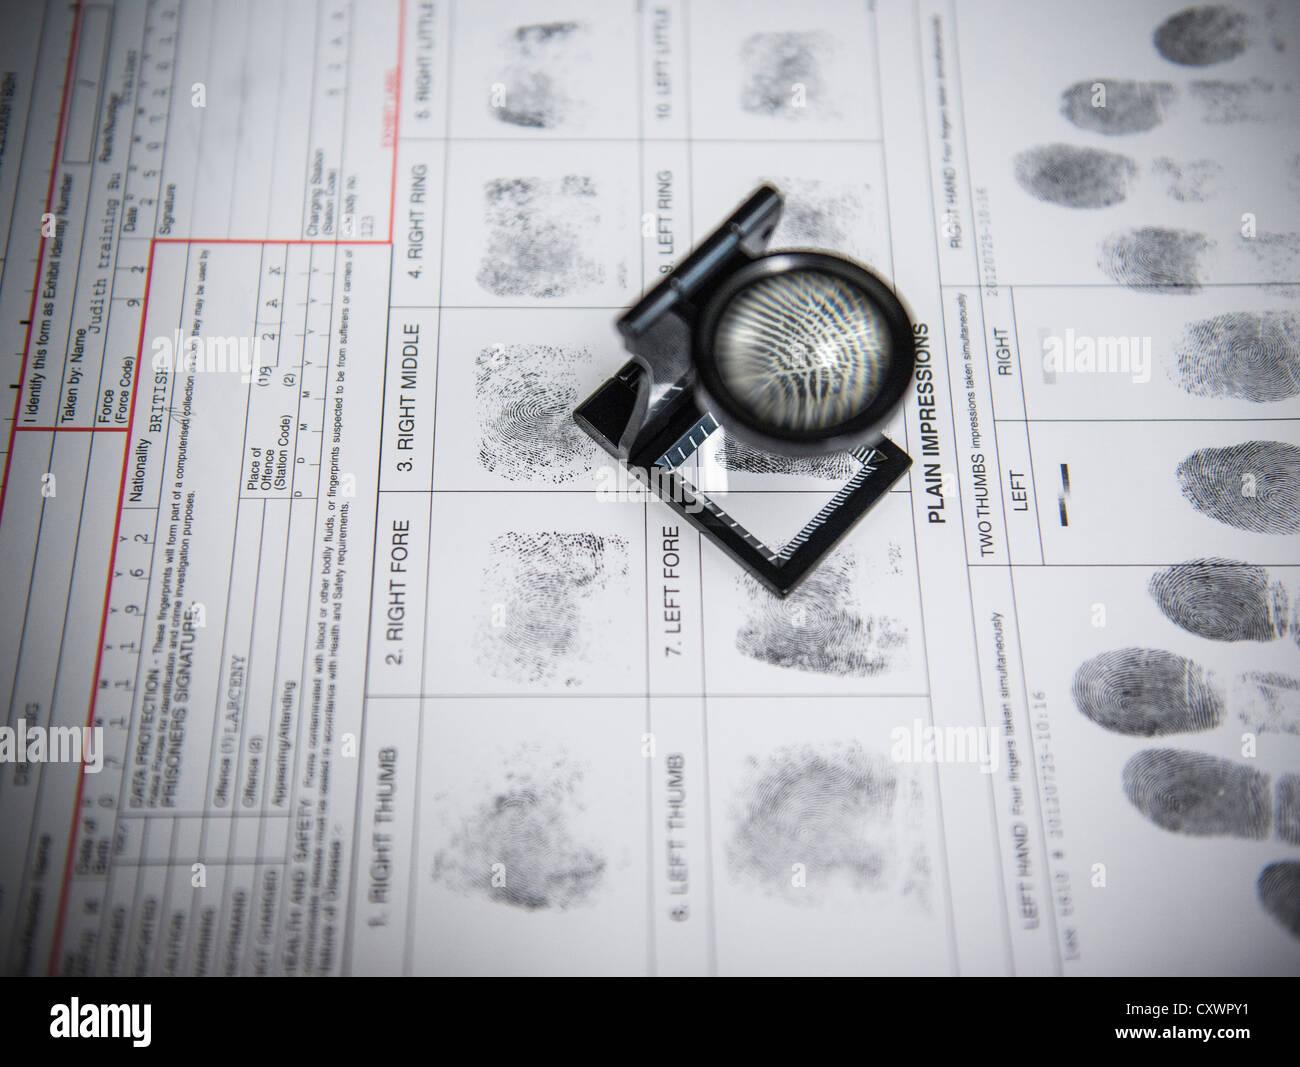 Lupe über Fingerabdrücke auf Verhaftung form Stockbild